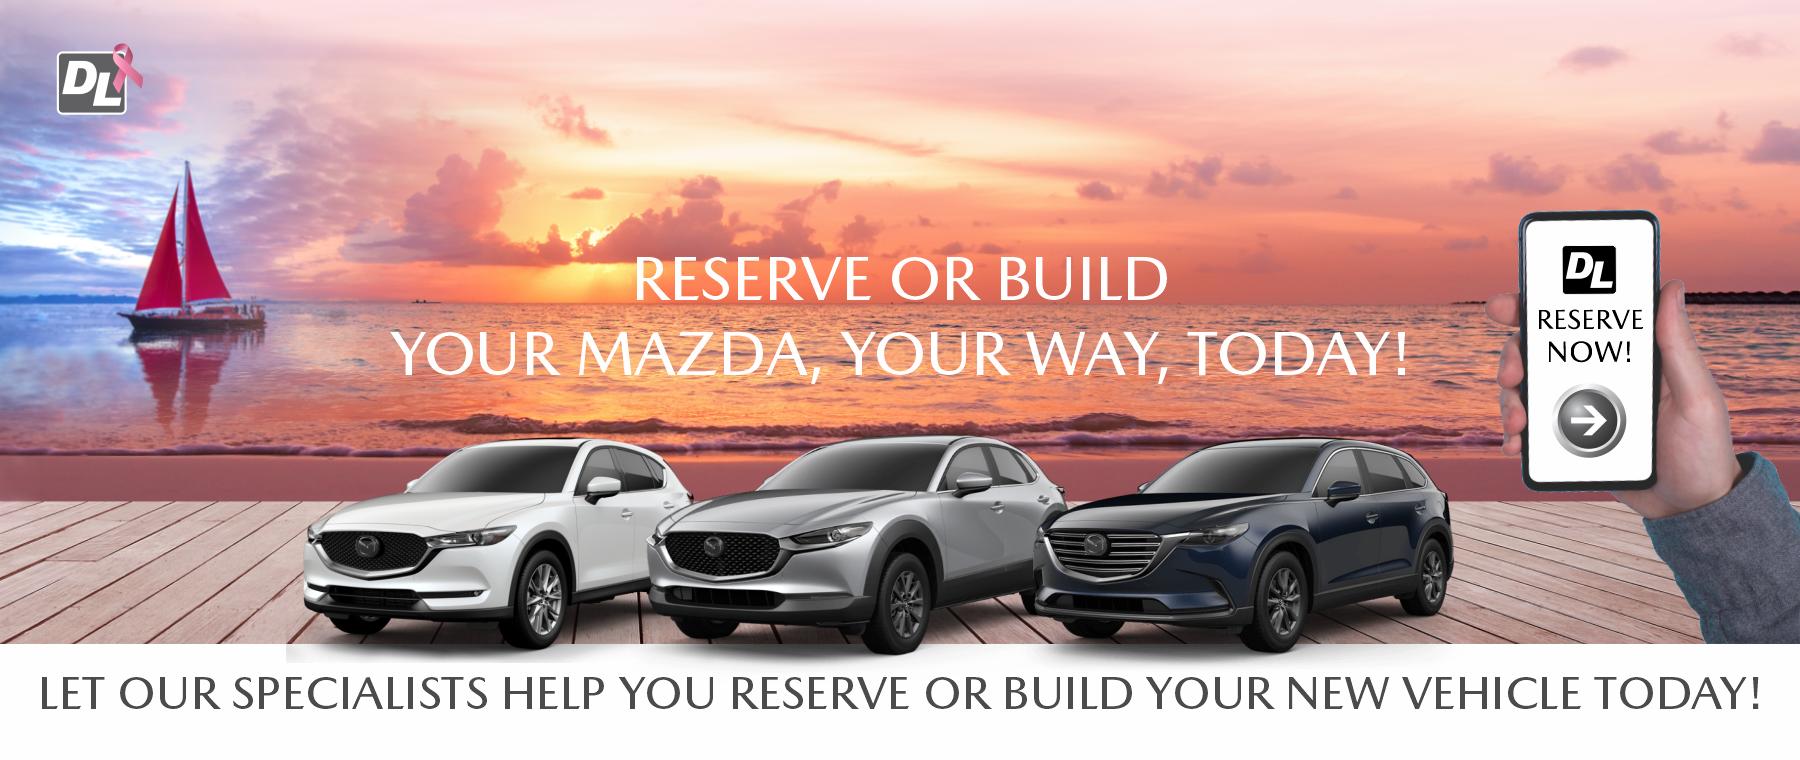 2021OctBanners-Mazda-Hero